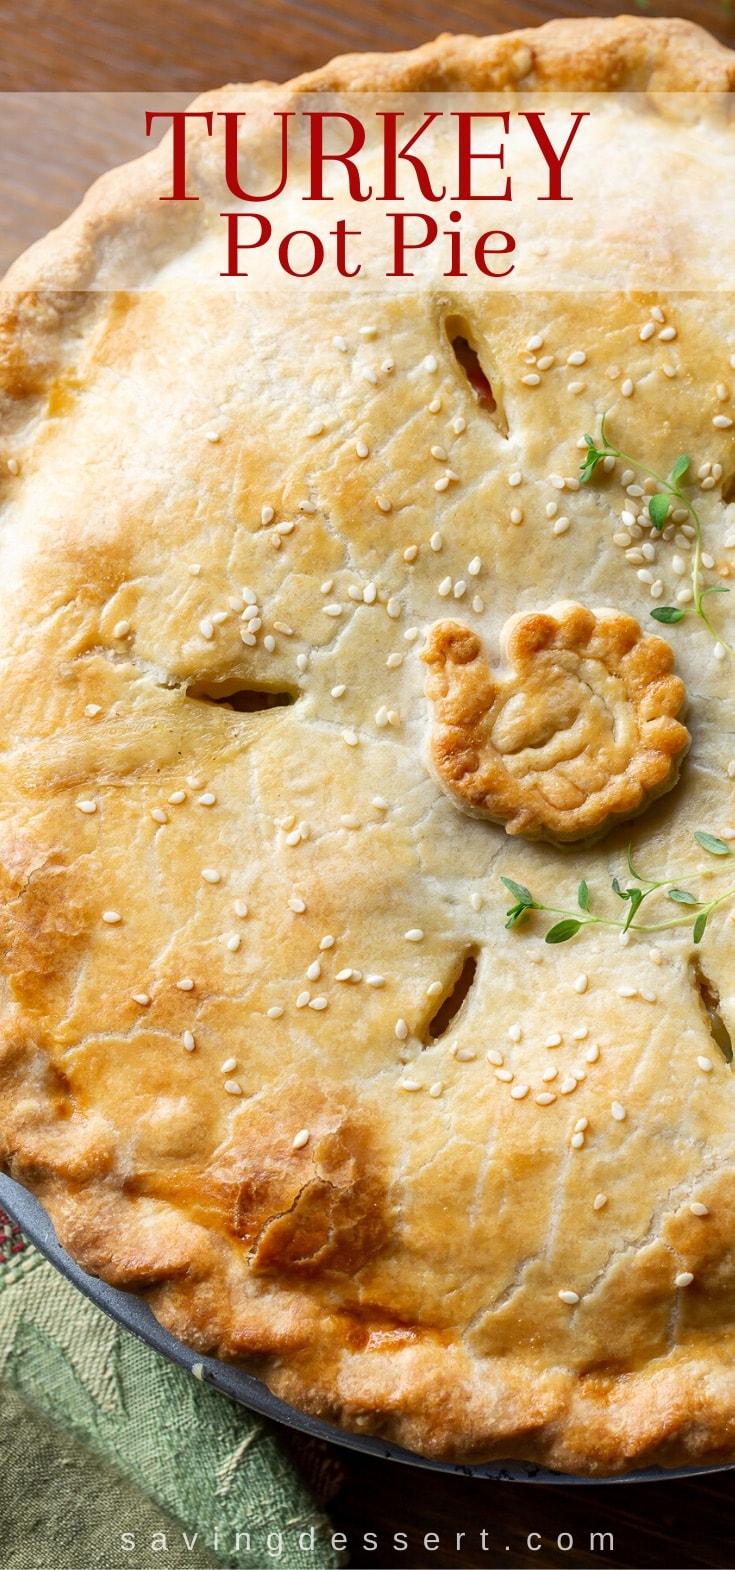 A close up of a savory turkey pot pie